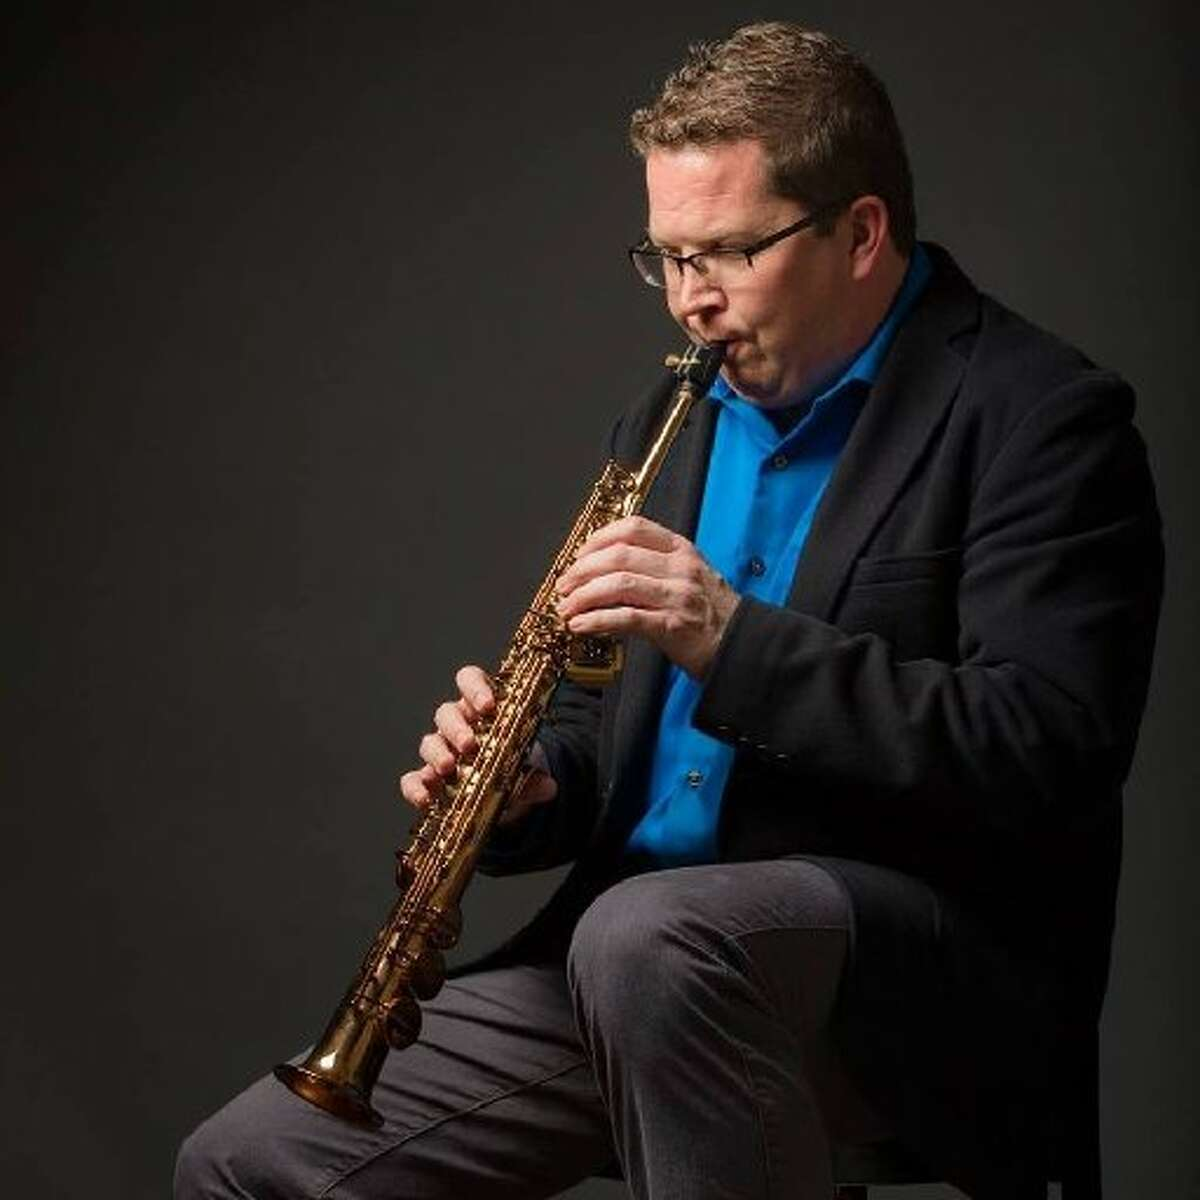 Internationally known Houston saxophonist, composer and music educatorWoodyWitt